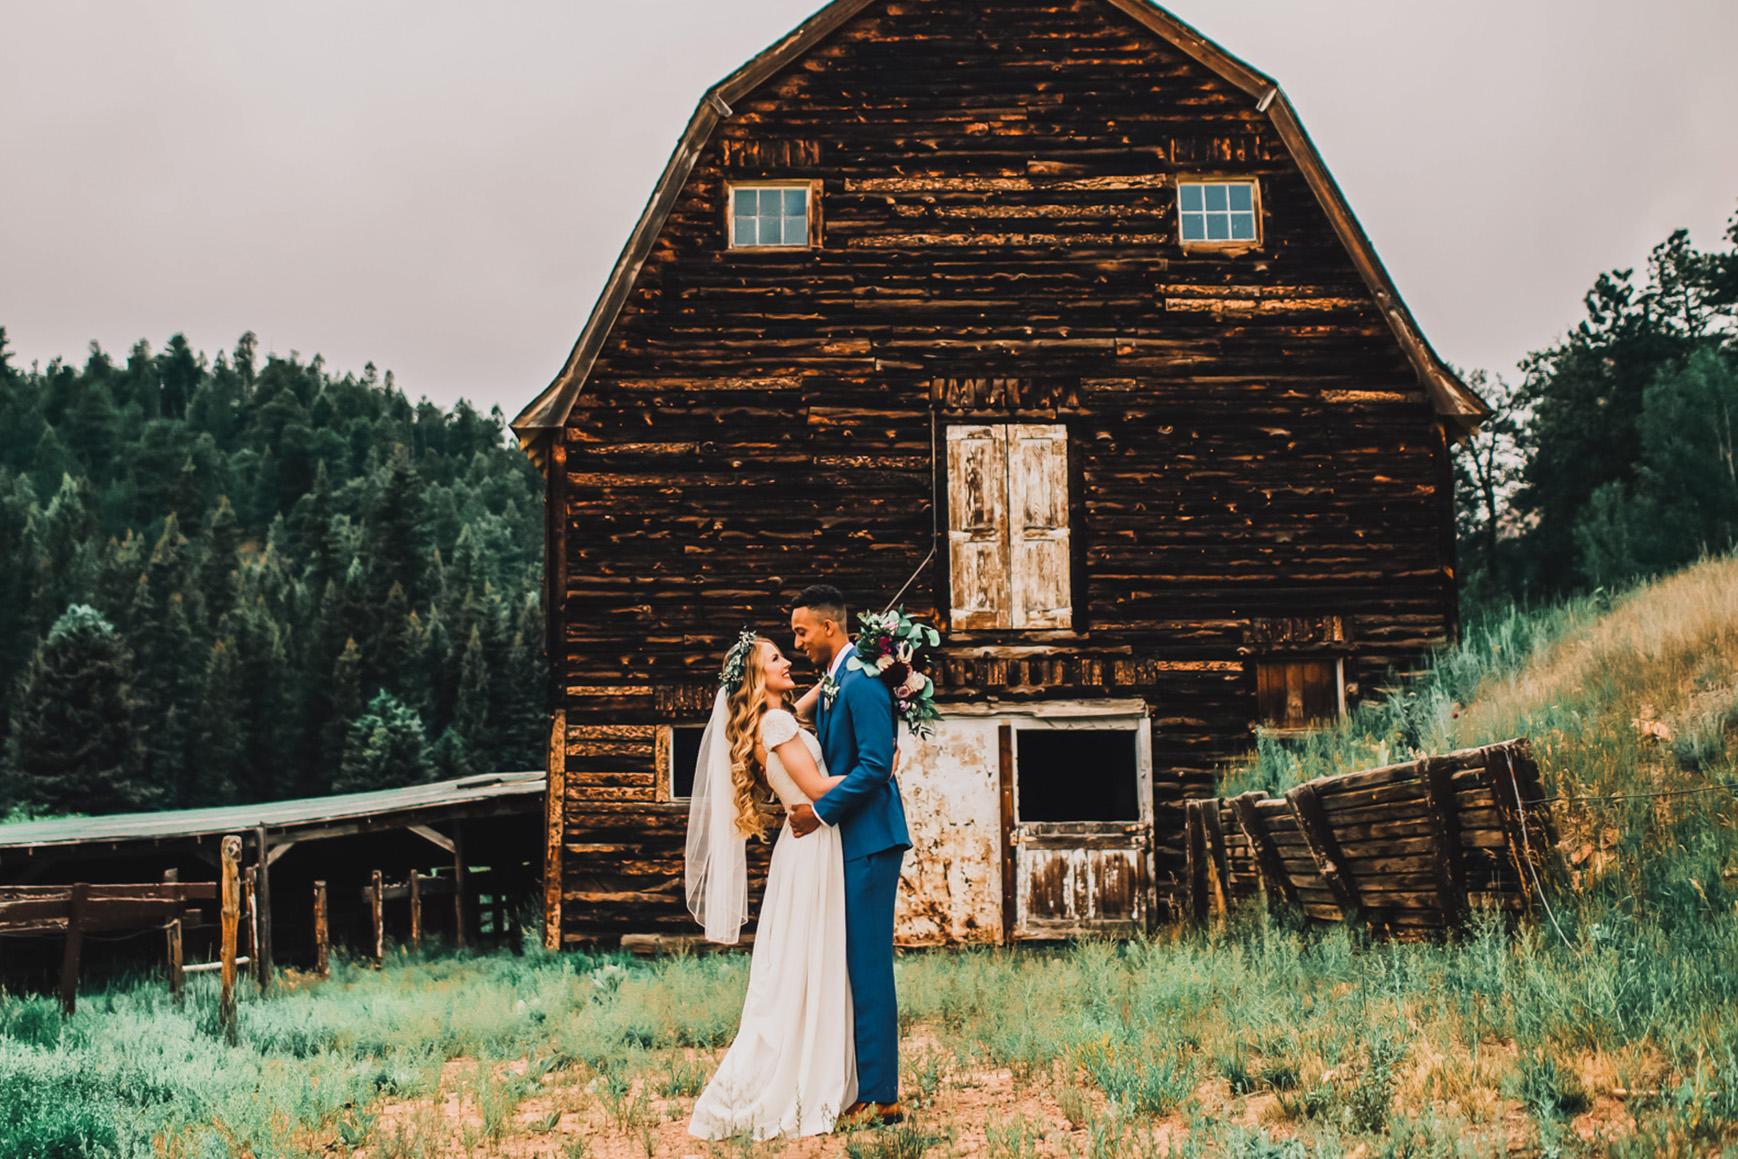 Rustic Barn Mountain View Ranch - Pine, Colorado - Jefferson County - Wedgewood Weddings